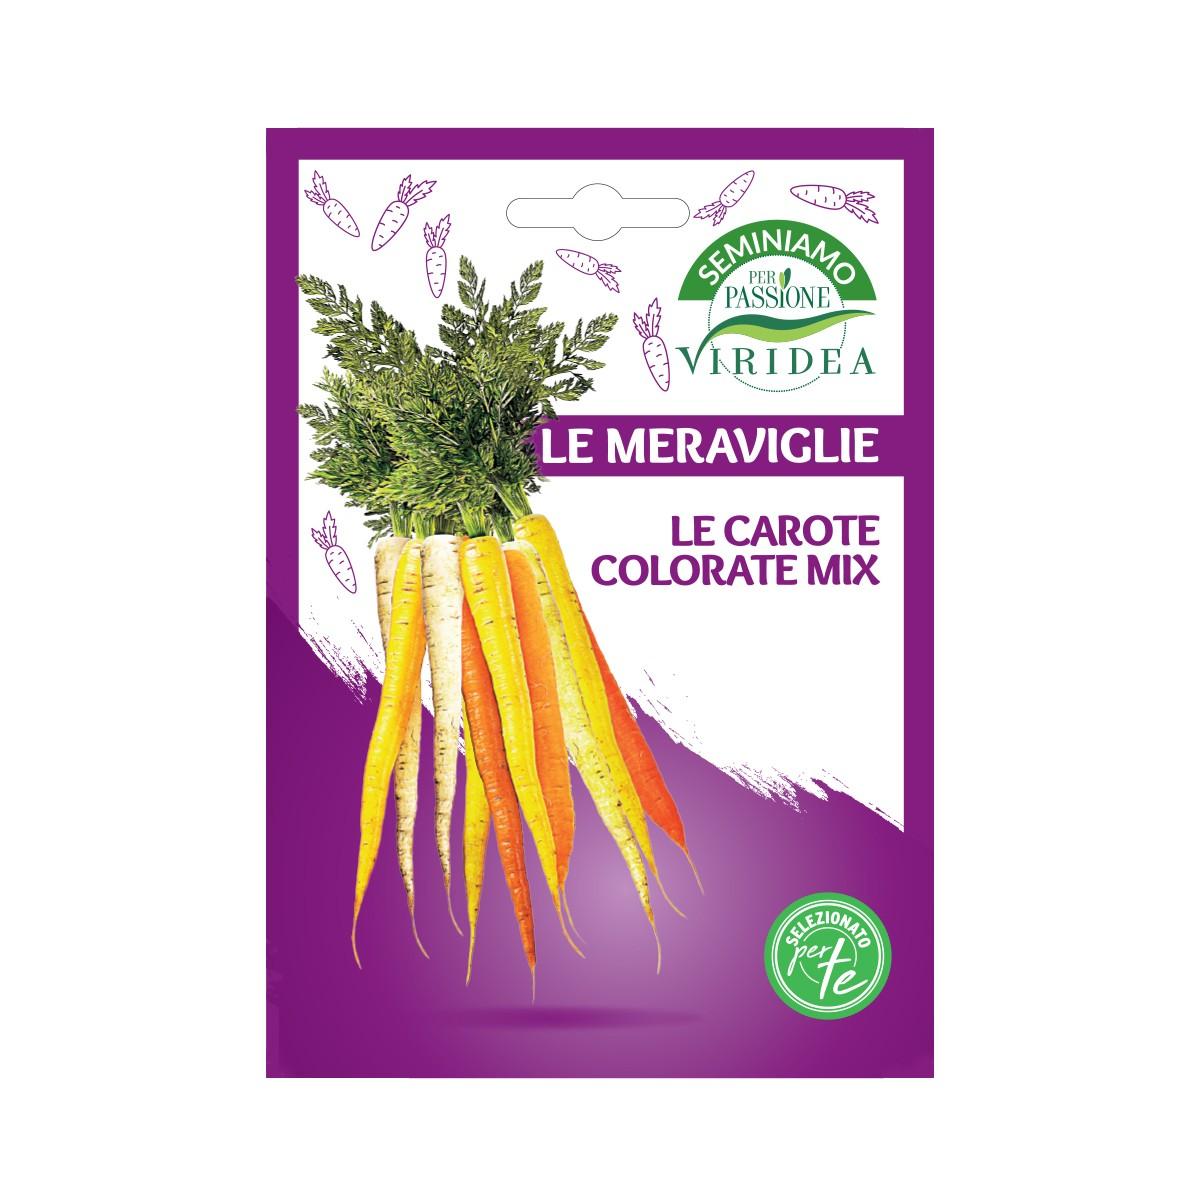 Mix Semi Carote Colorate Viridea